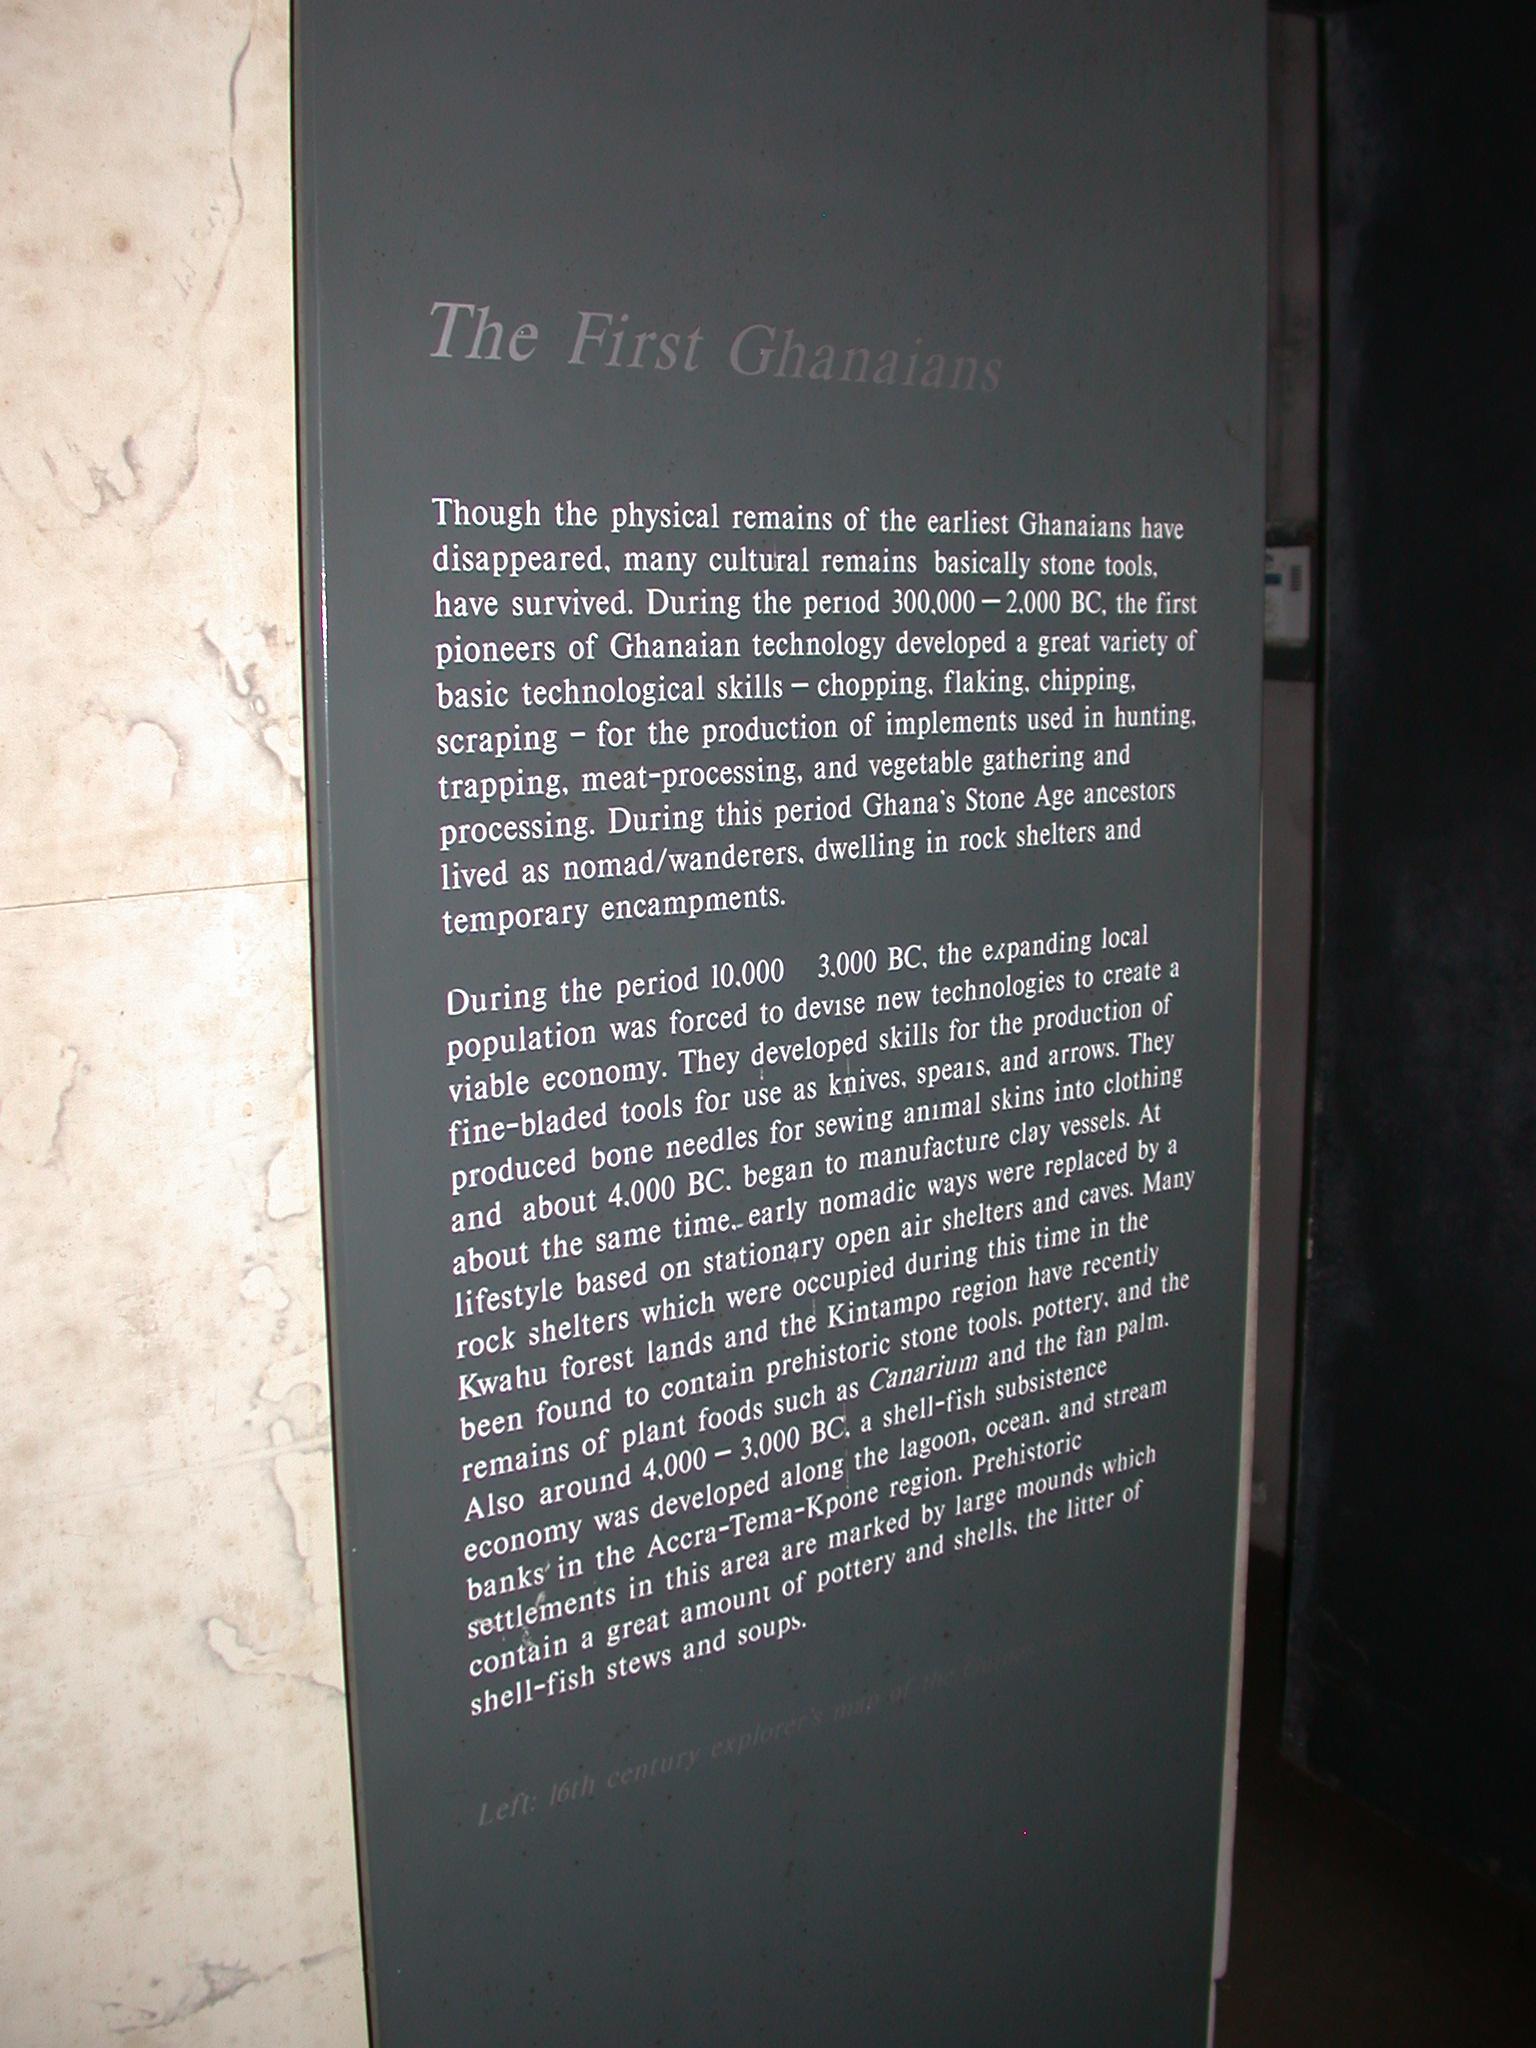 The First Ghanaians Description, Cape Coast Slave Fort Museum, Cape Coast, Ghana